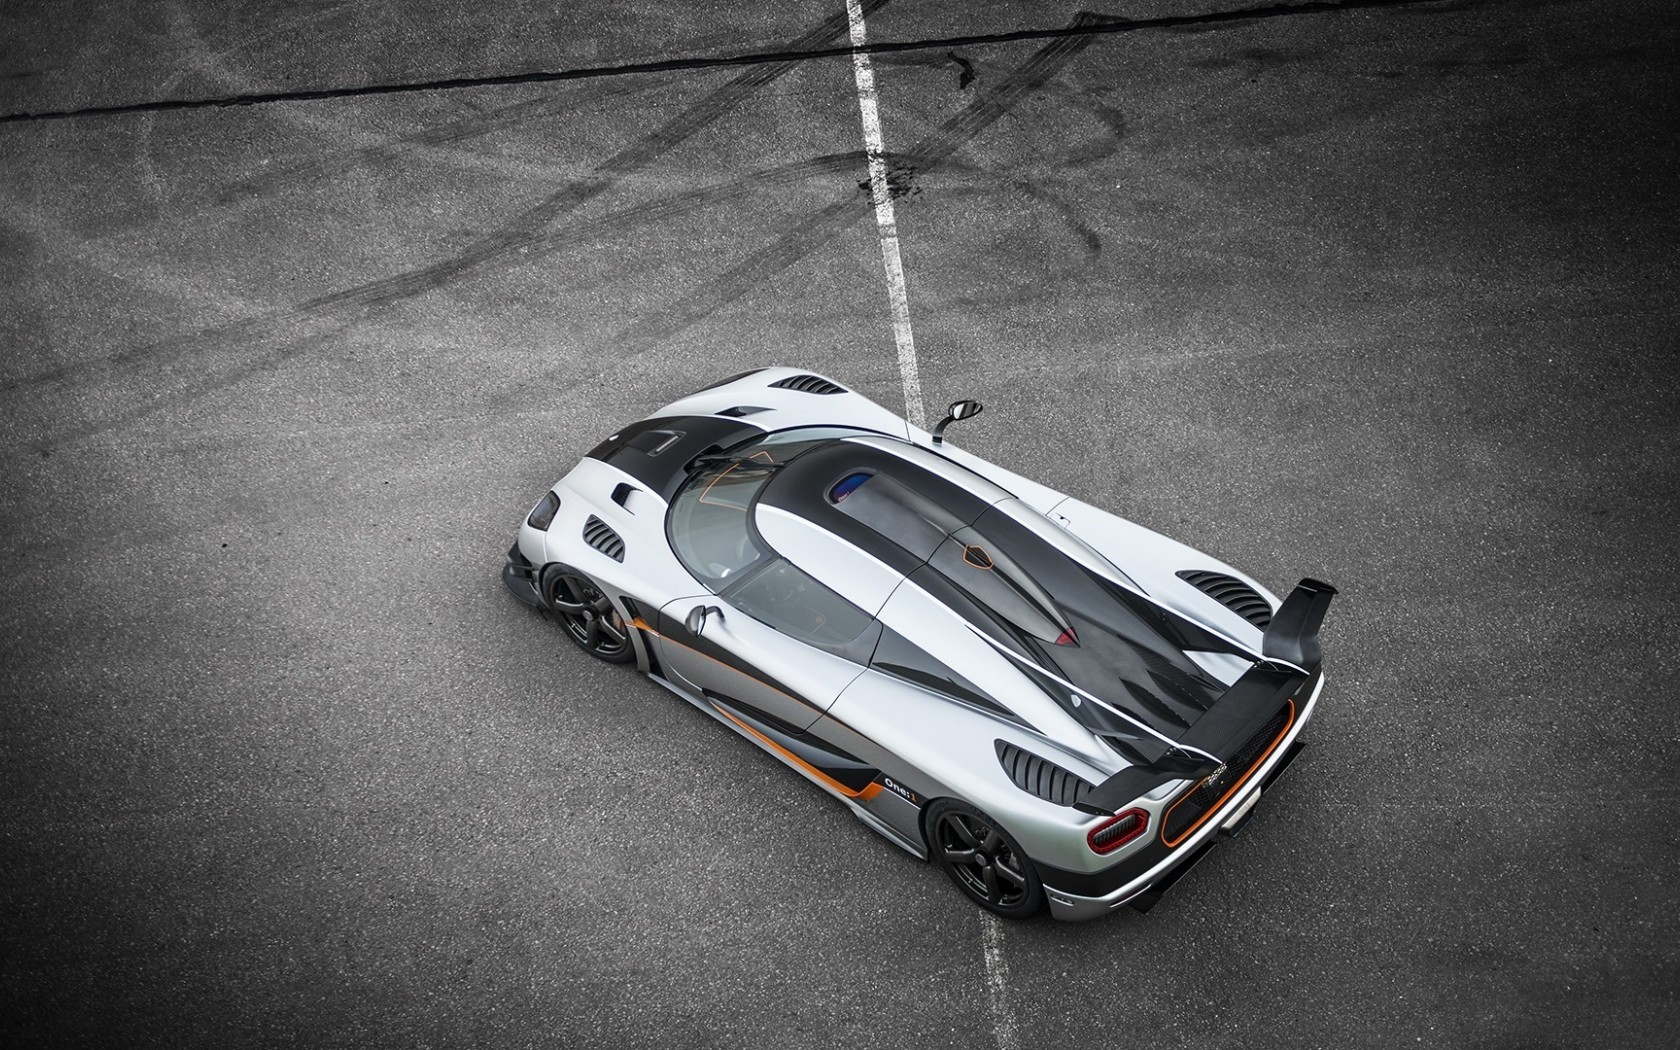 General 1680x1050 Koenigsegg One:1 supercars car vehicle silver cars